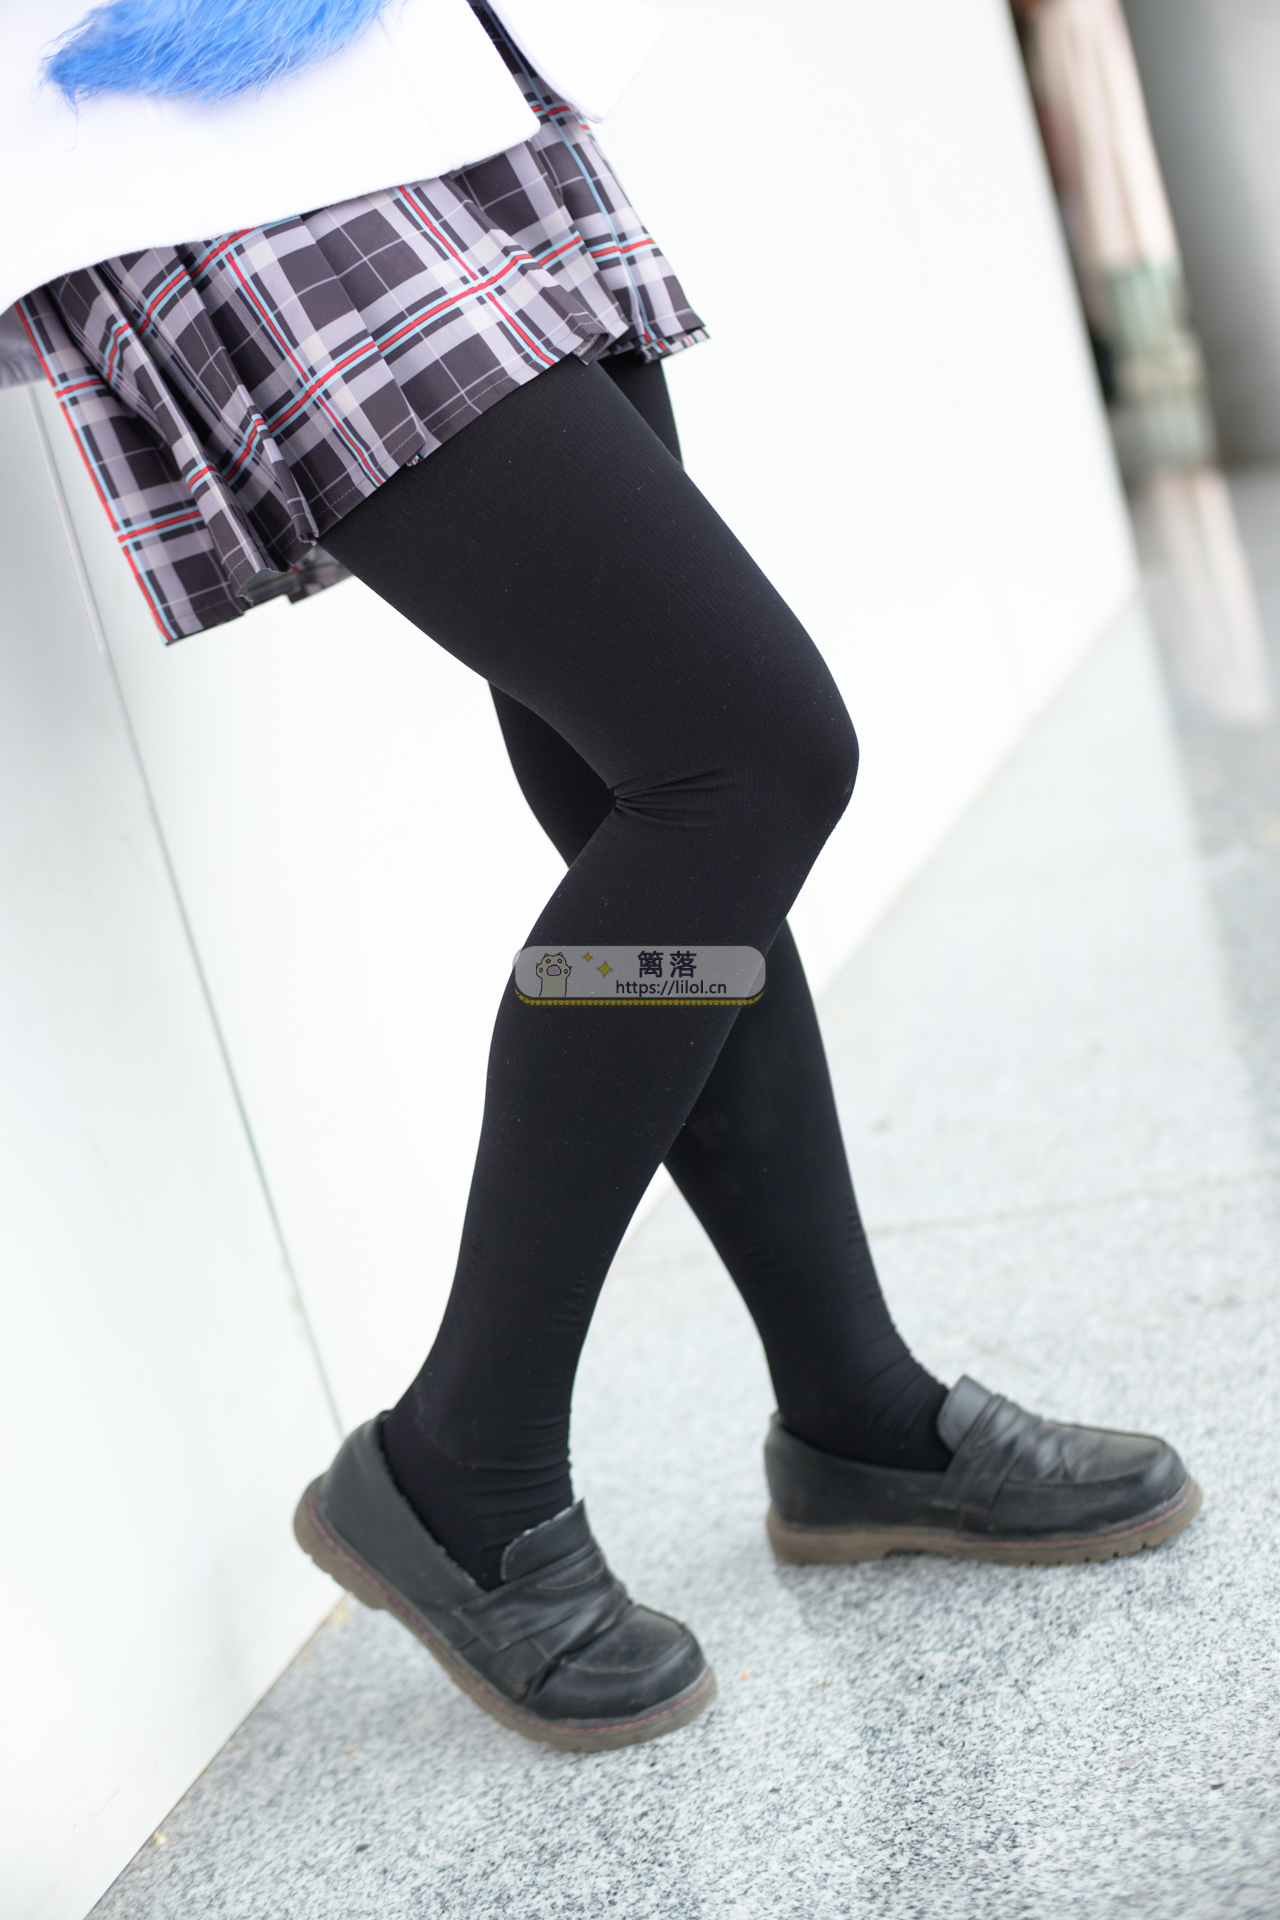 【FREE系列】森萝财团写真 FREE-007 白丝+黑丝短裙制服装室外写真 [83图-1视频-1.5GB] FREE系列 第3张